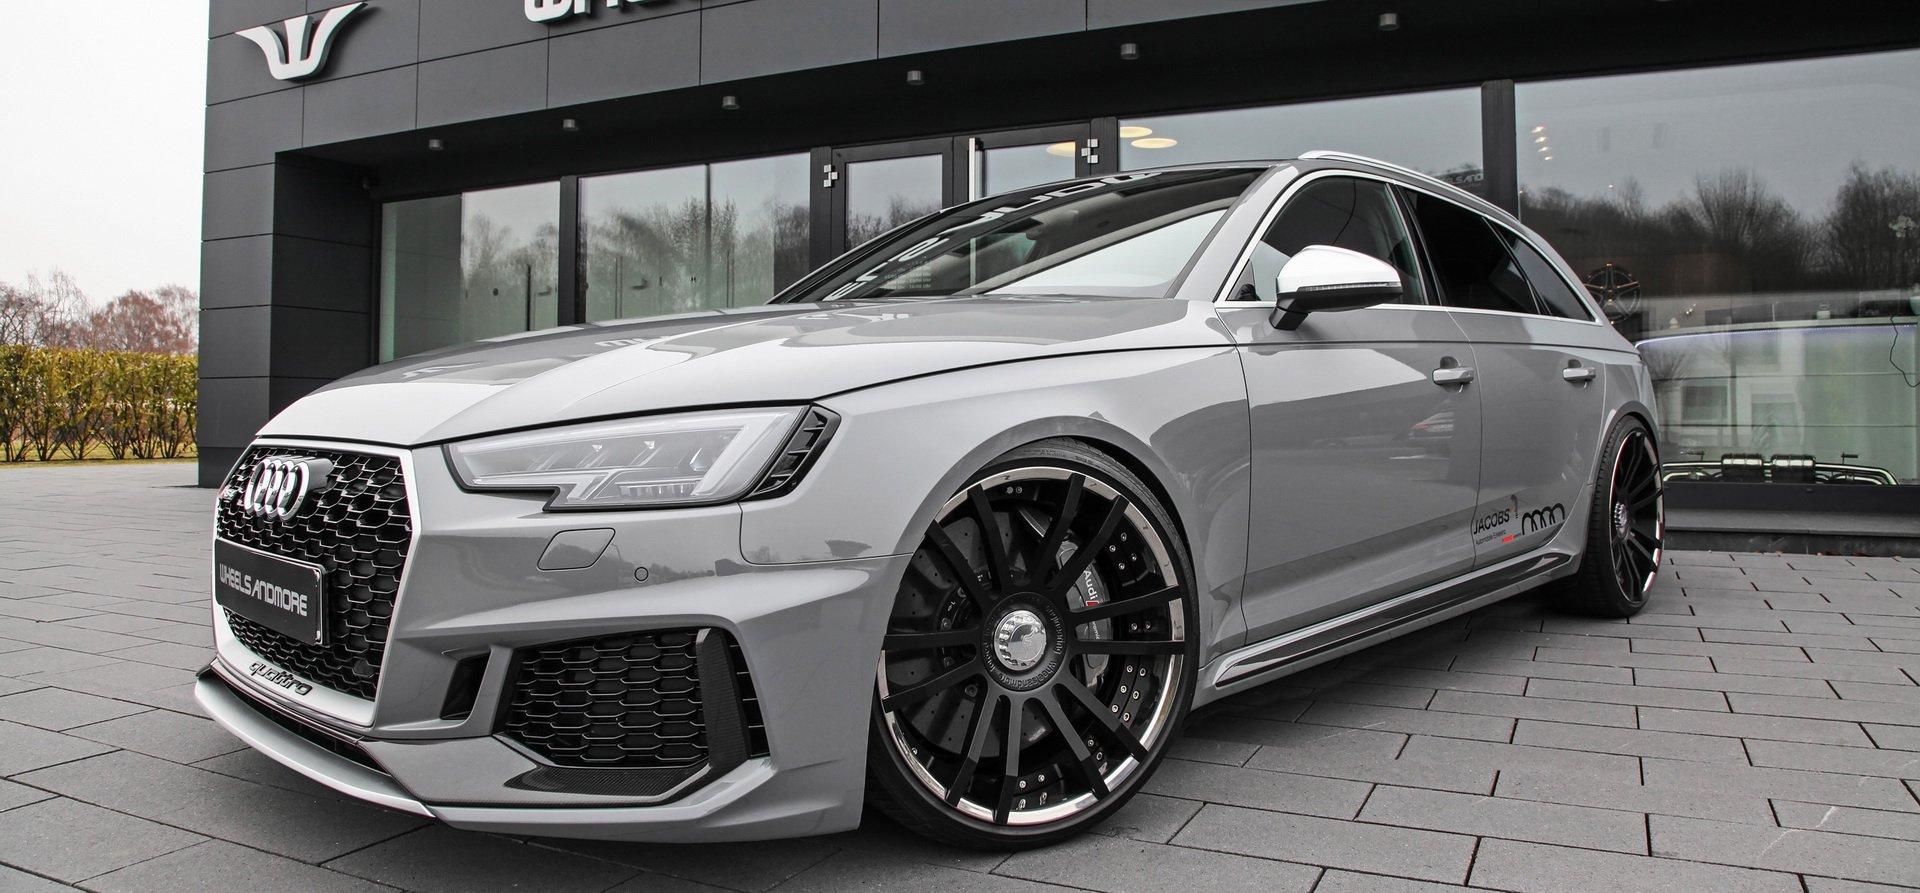 audi-rs4-avant-b9-wheelsandmore-grey-tuning-2018-1.jpg